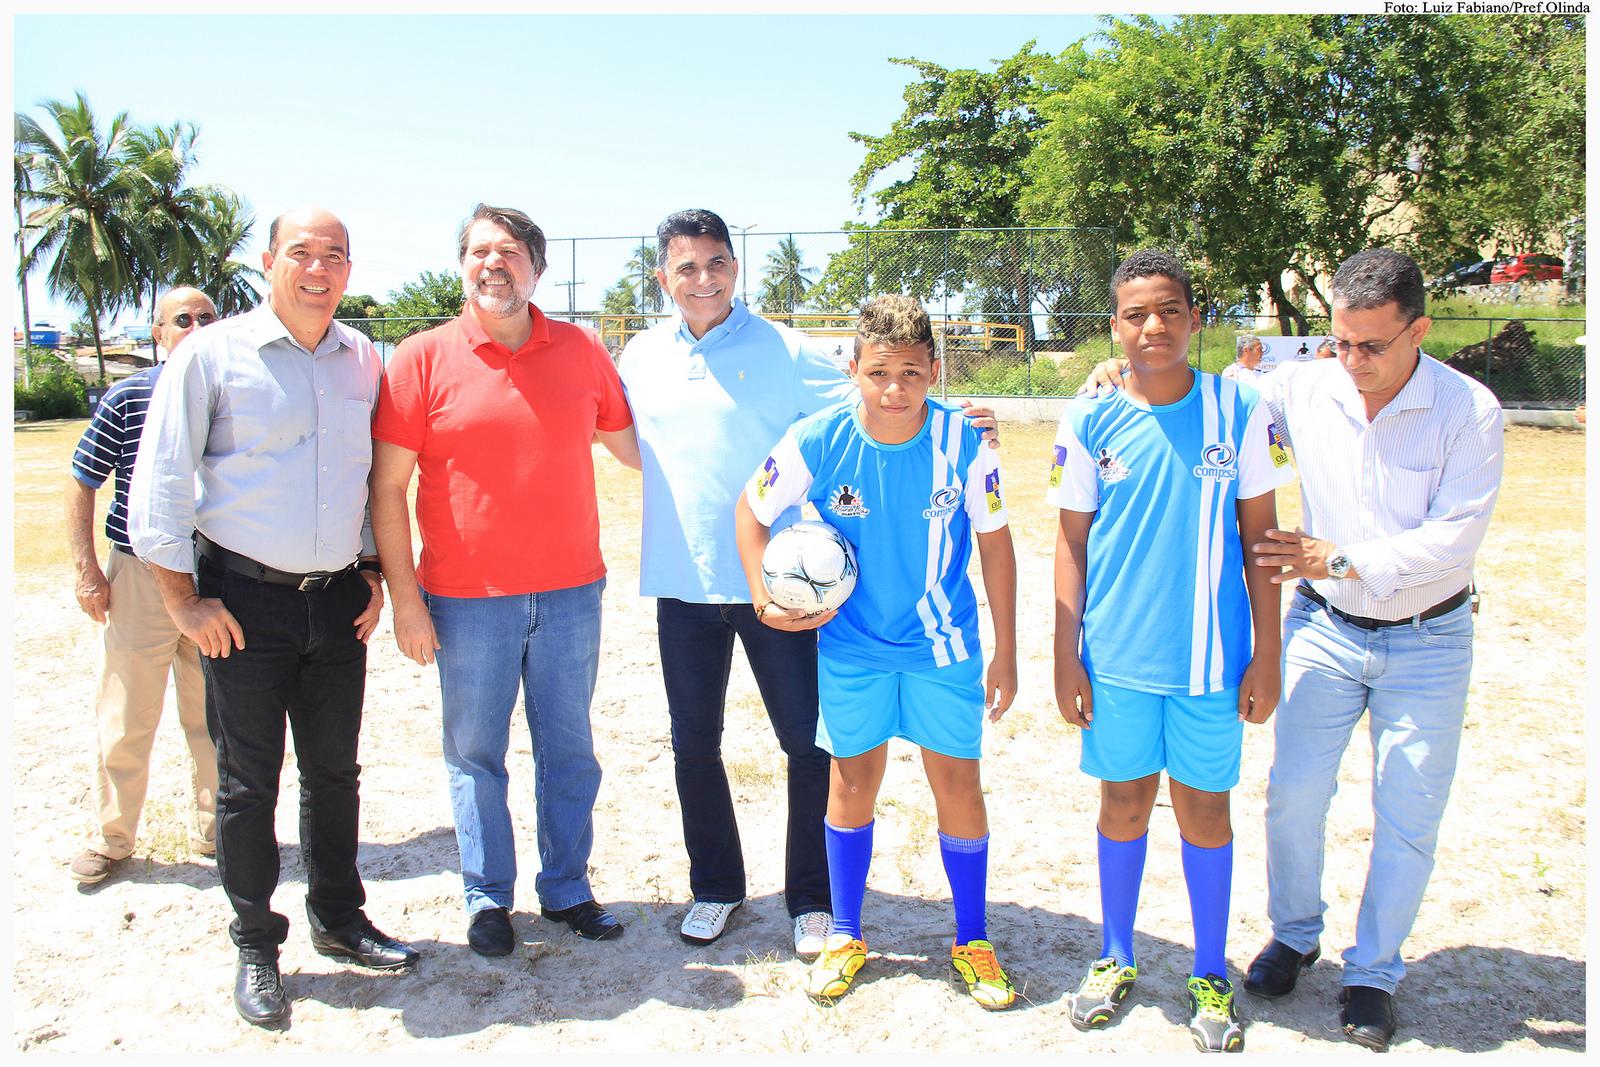 Projeto Futuro Campeão no Combate às Drogas. Foto: Luiz Fabiano/Pref.Olinda